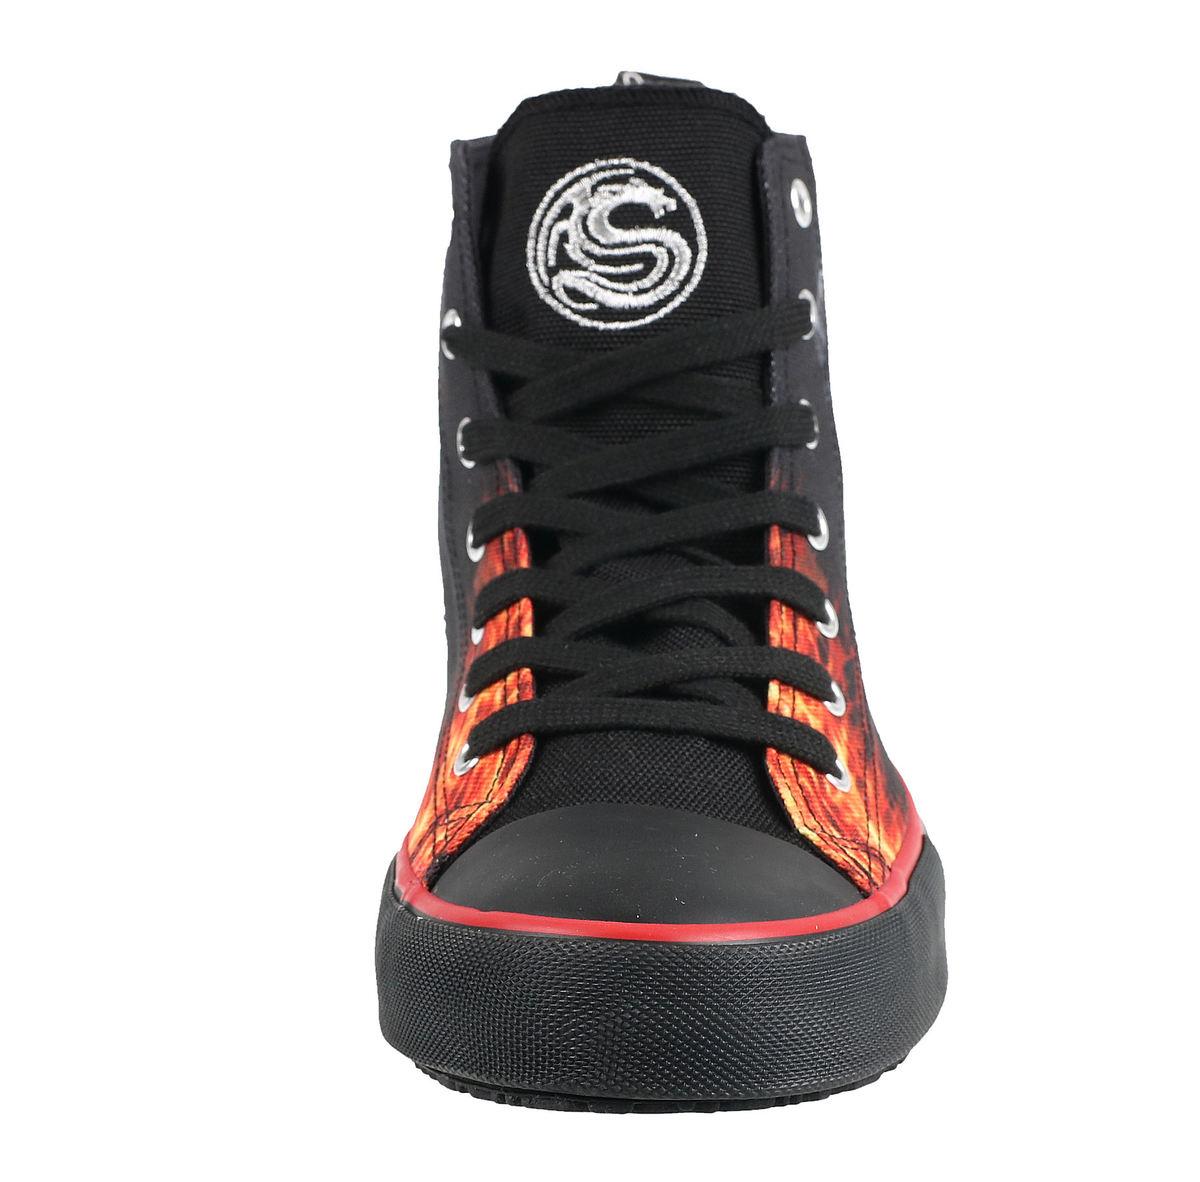 4c8e696359 topánky pánske SPIRAL - ACE REAPER - T155S001 - metalshop.sk